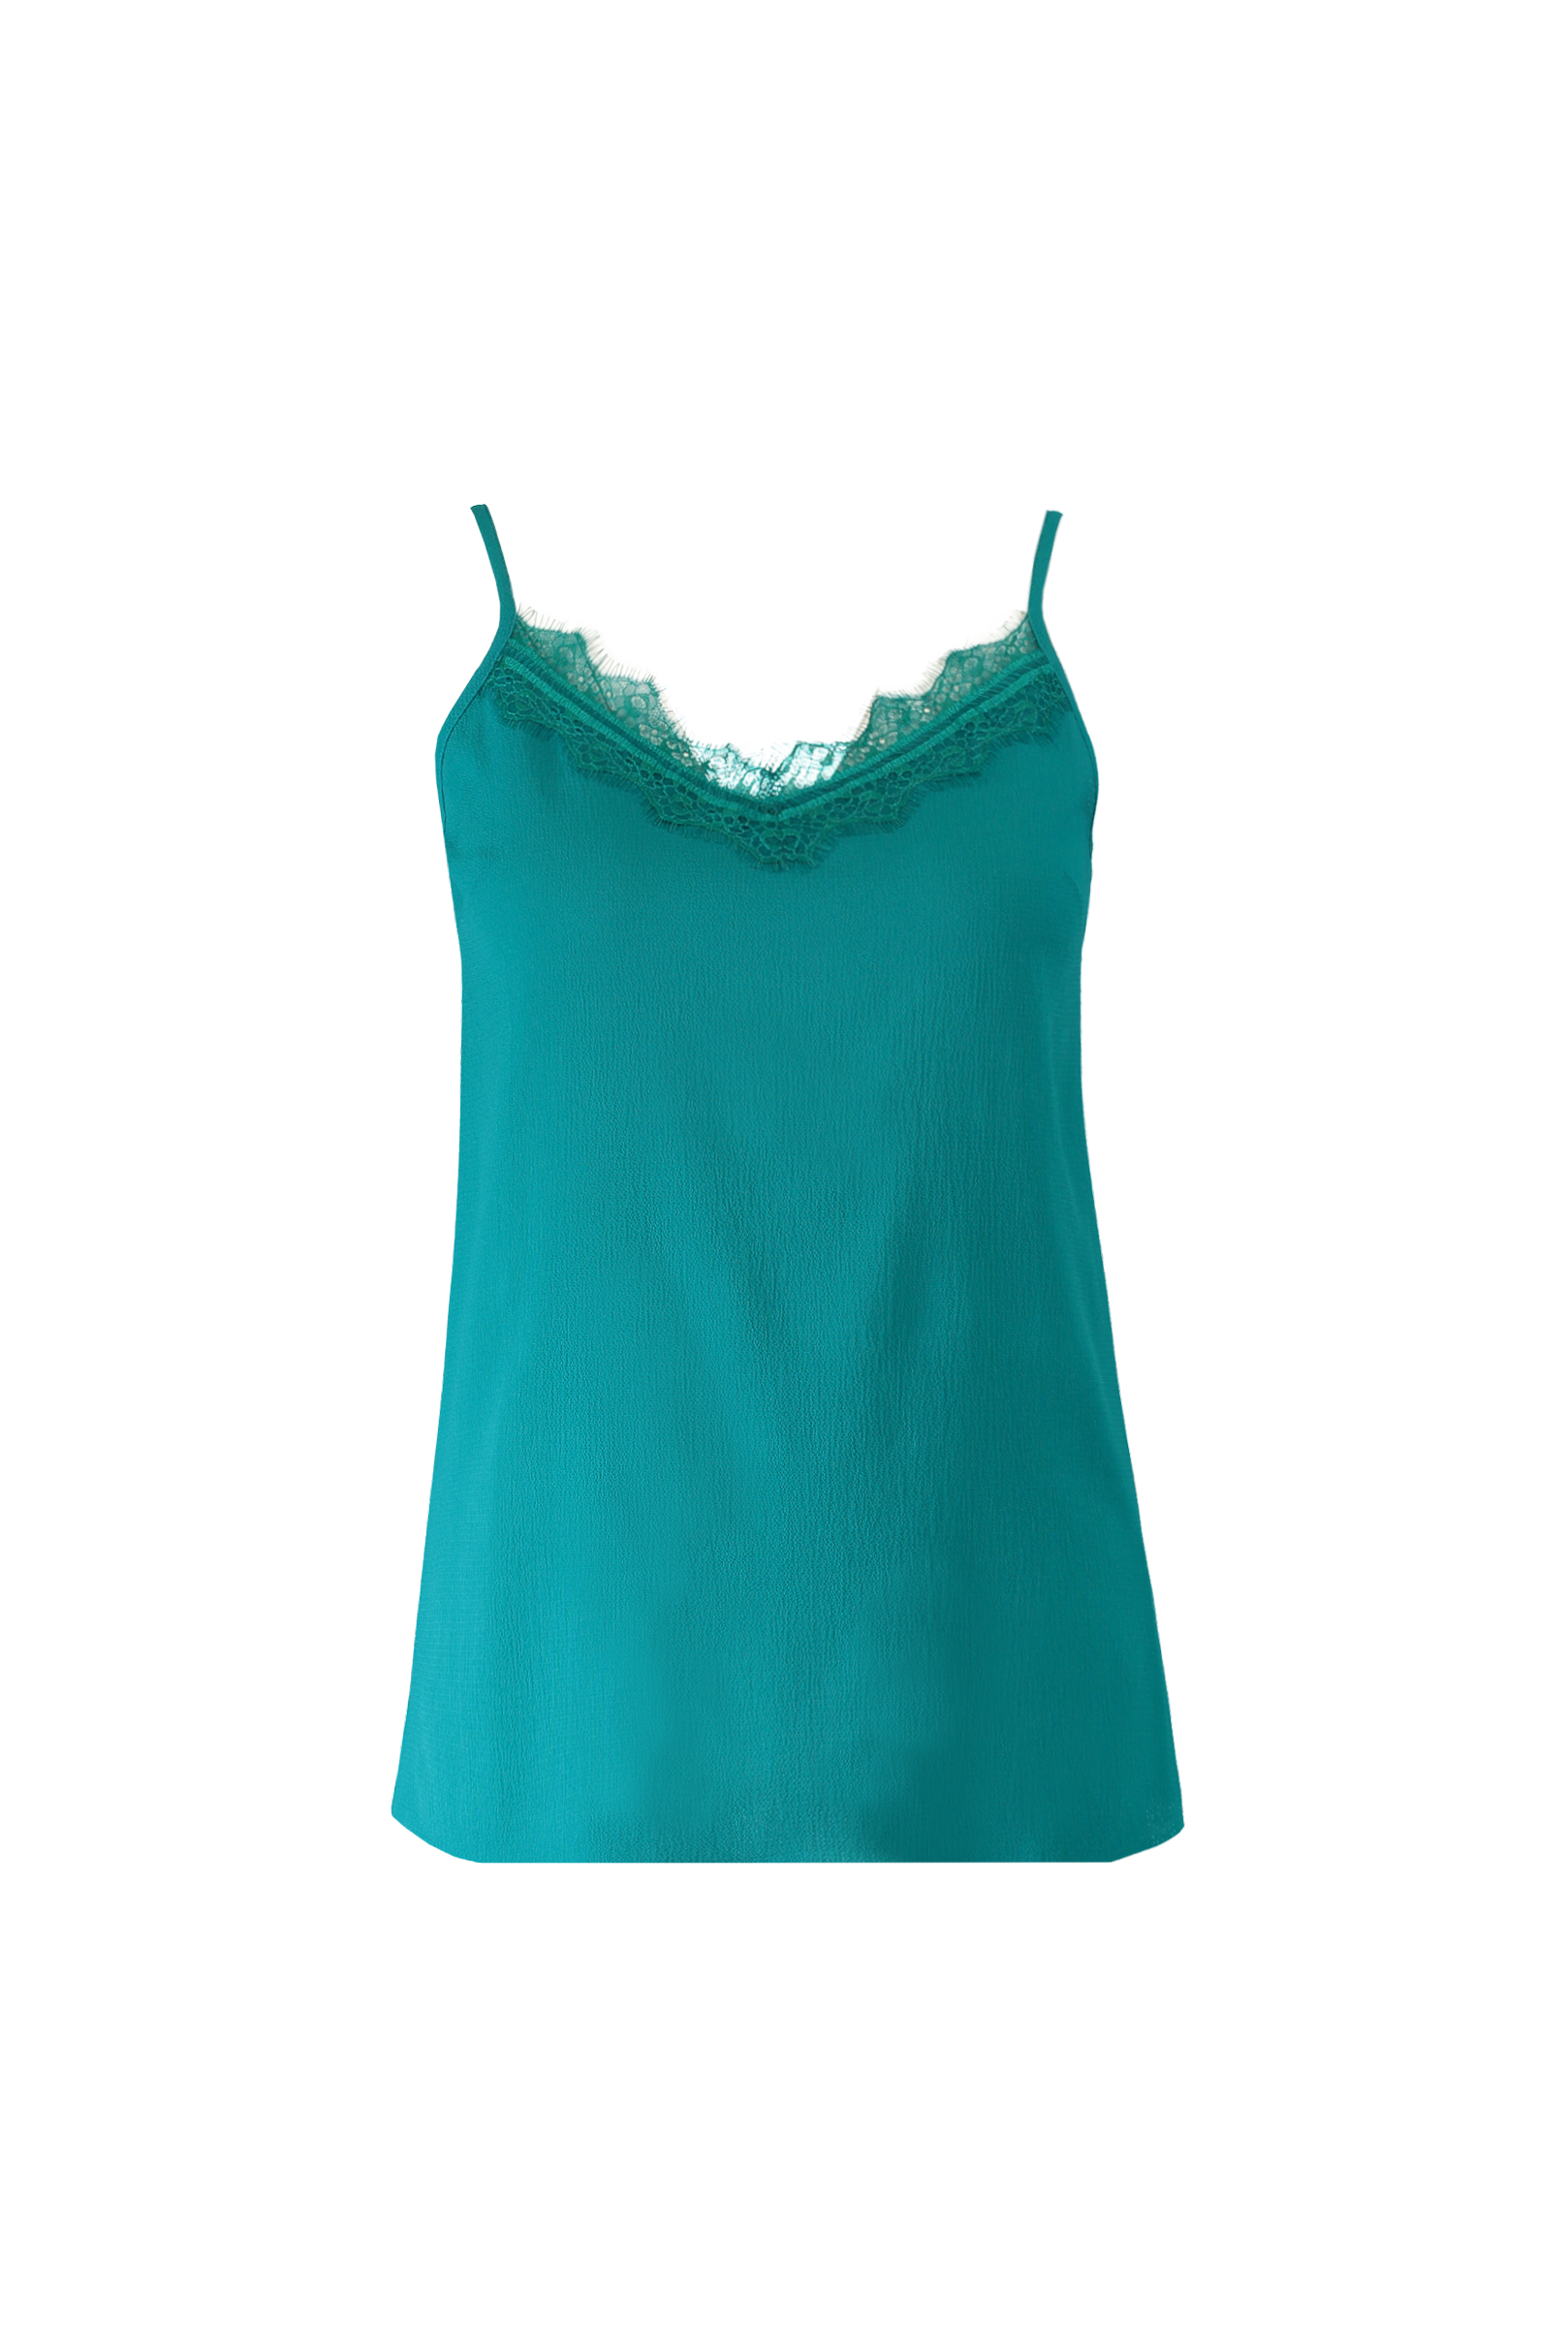 Afbeelding van MS Mode Blouses, Turquoise